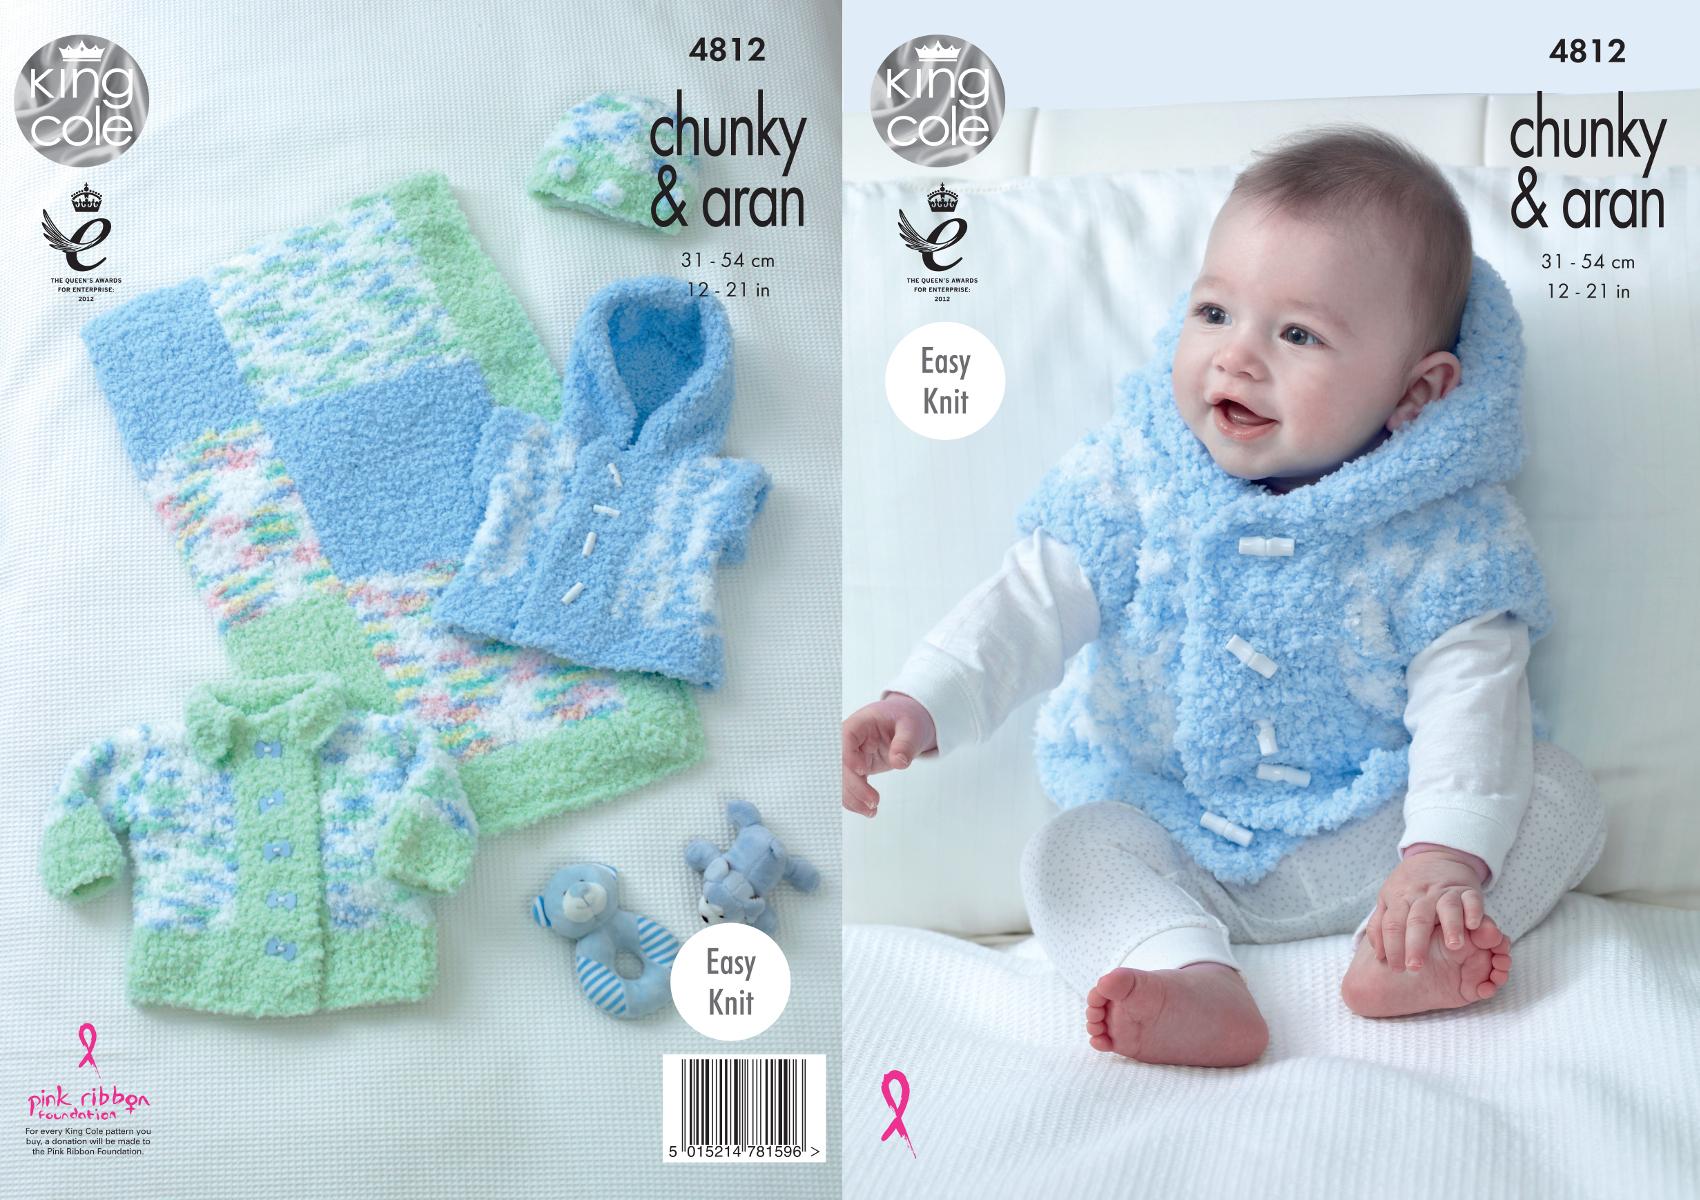 Knitting Pattern Gilet Aran : Easy Knit Baby Knitting Pattern Jacket Gilet Hat & Blanket King Cole Chun...